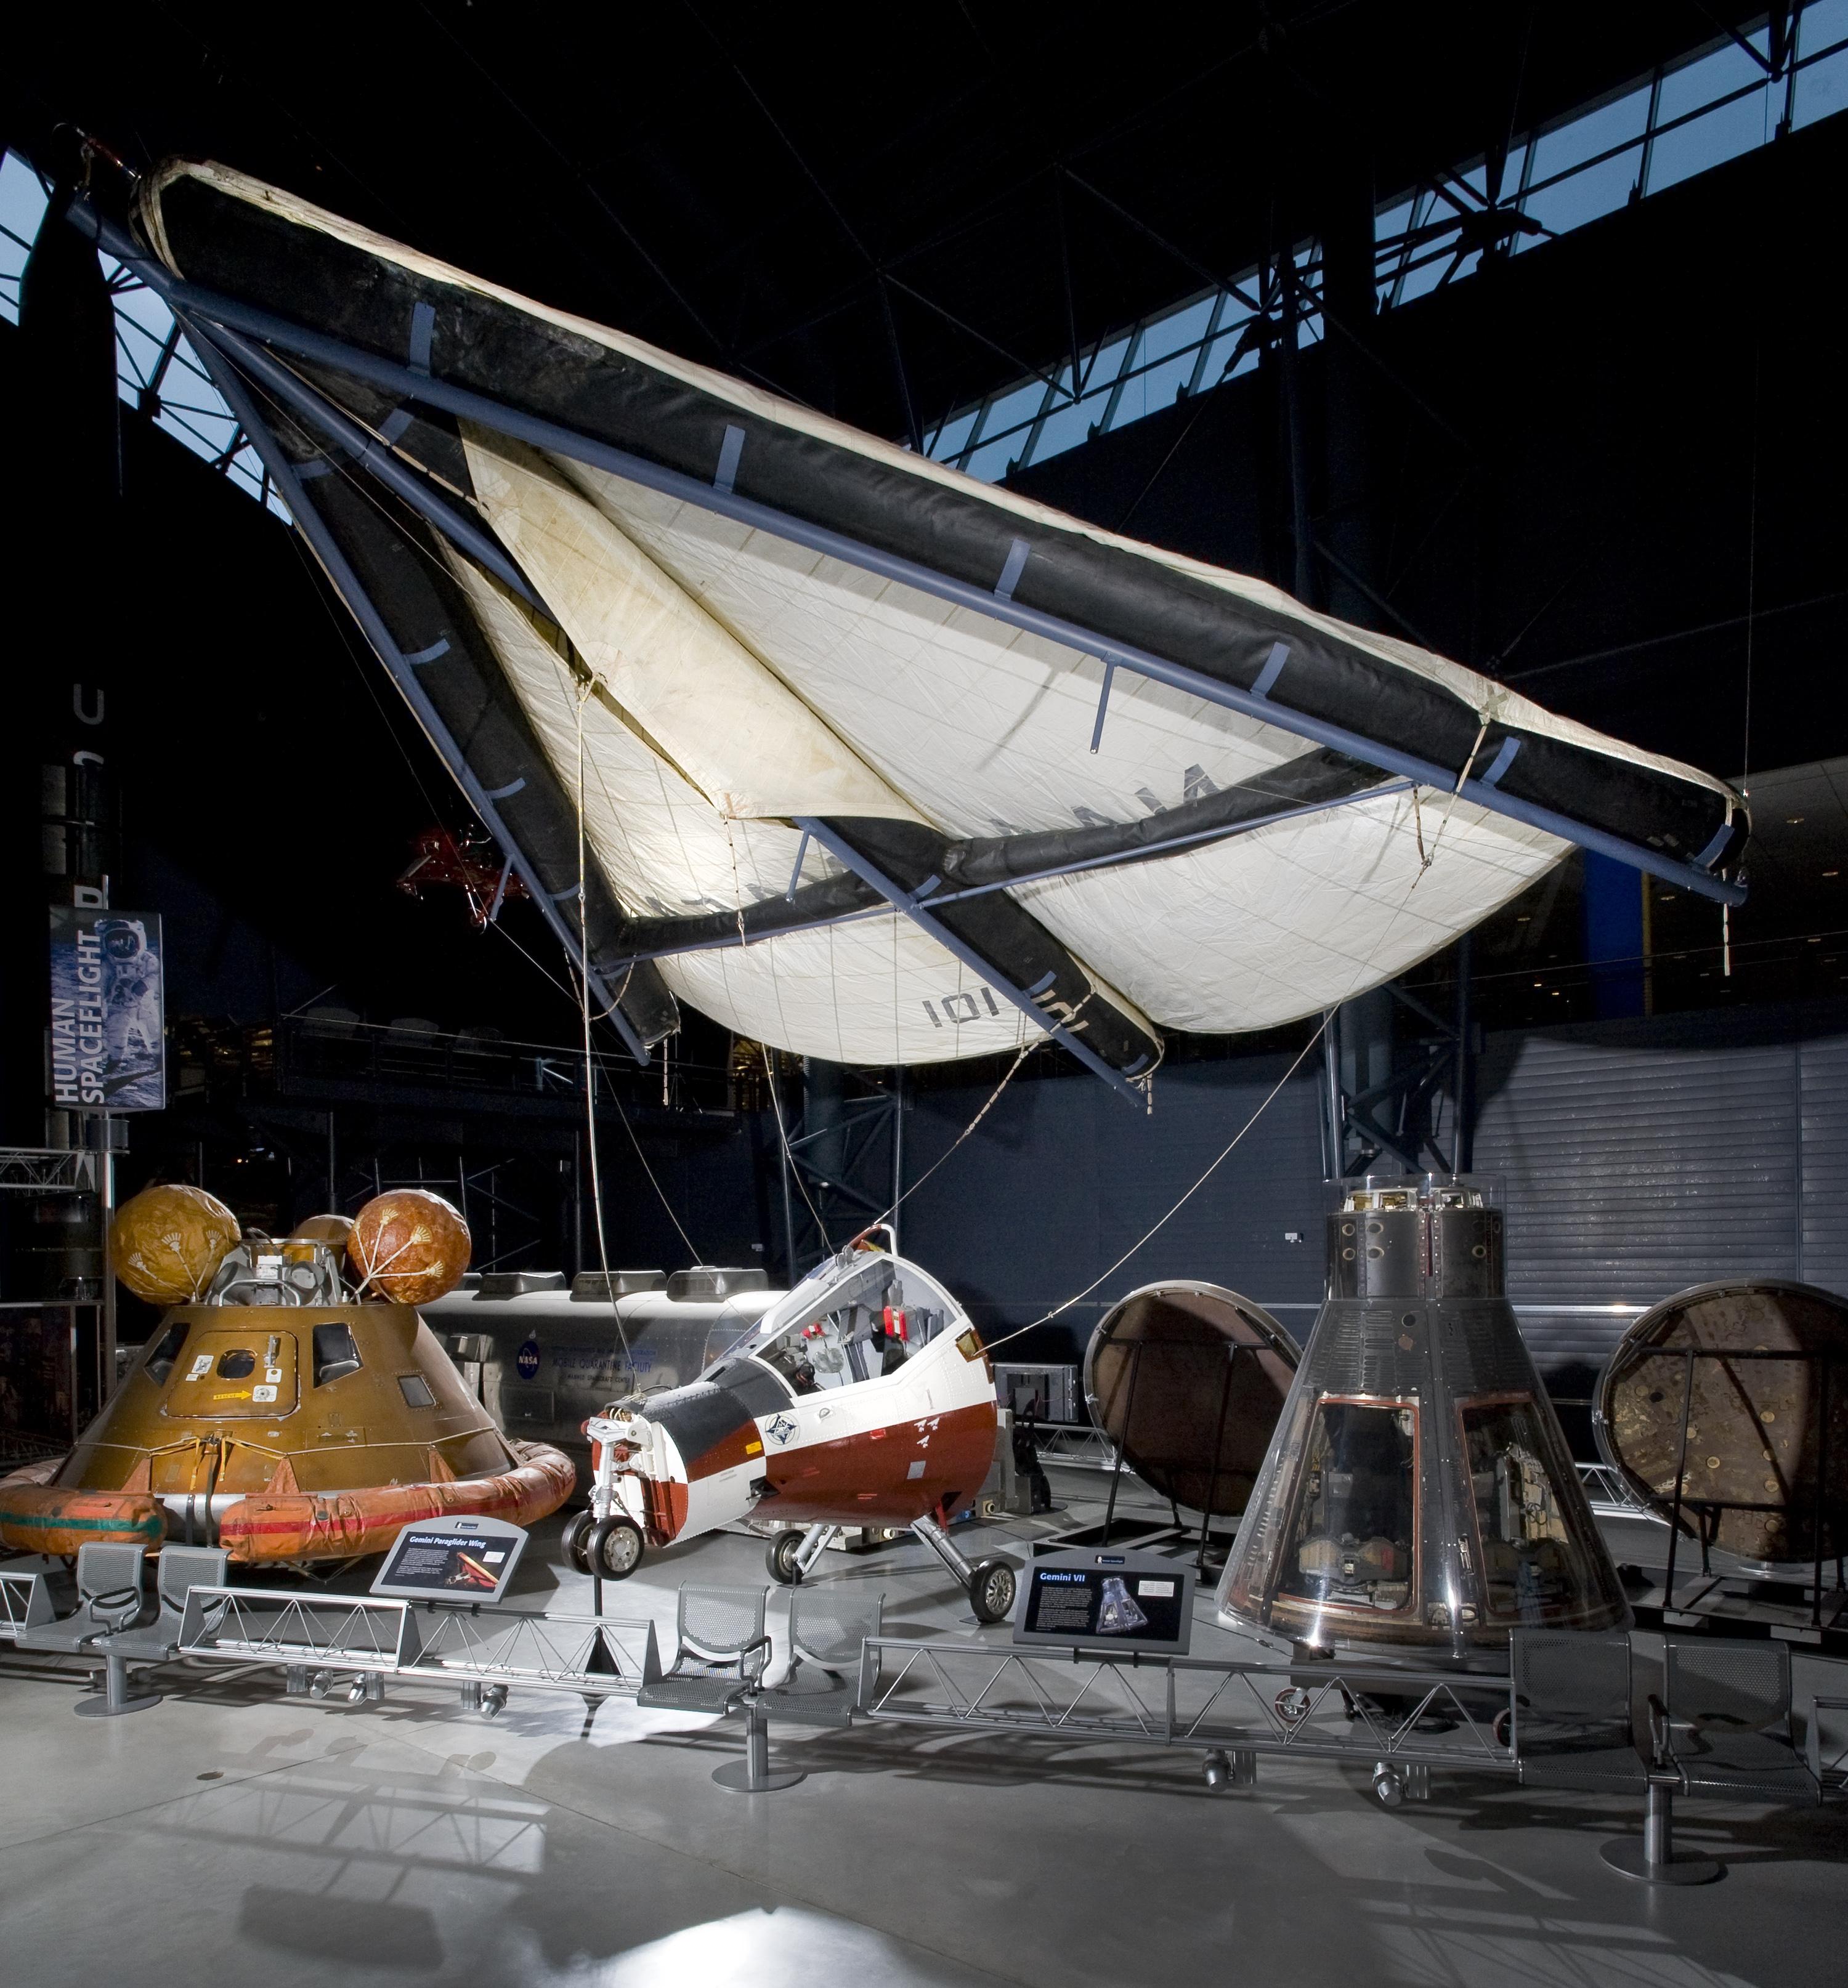 Gemini TTV-1 Paraglider Capsule